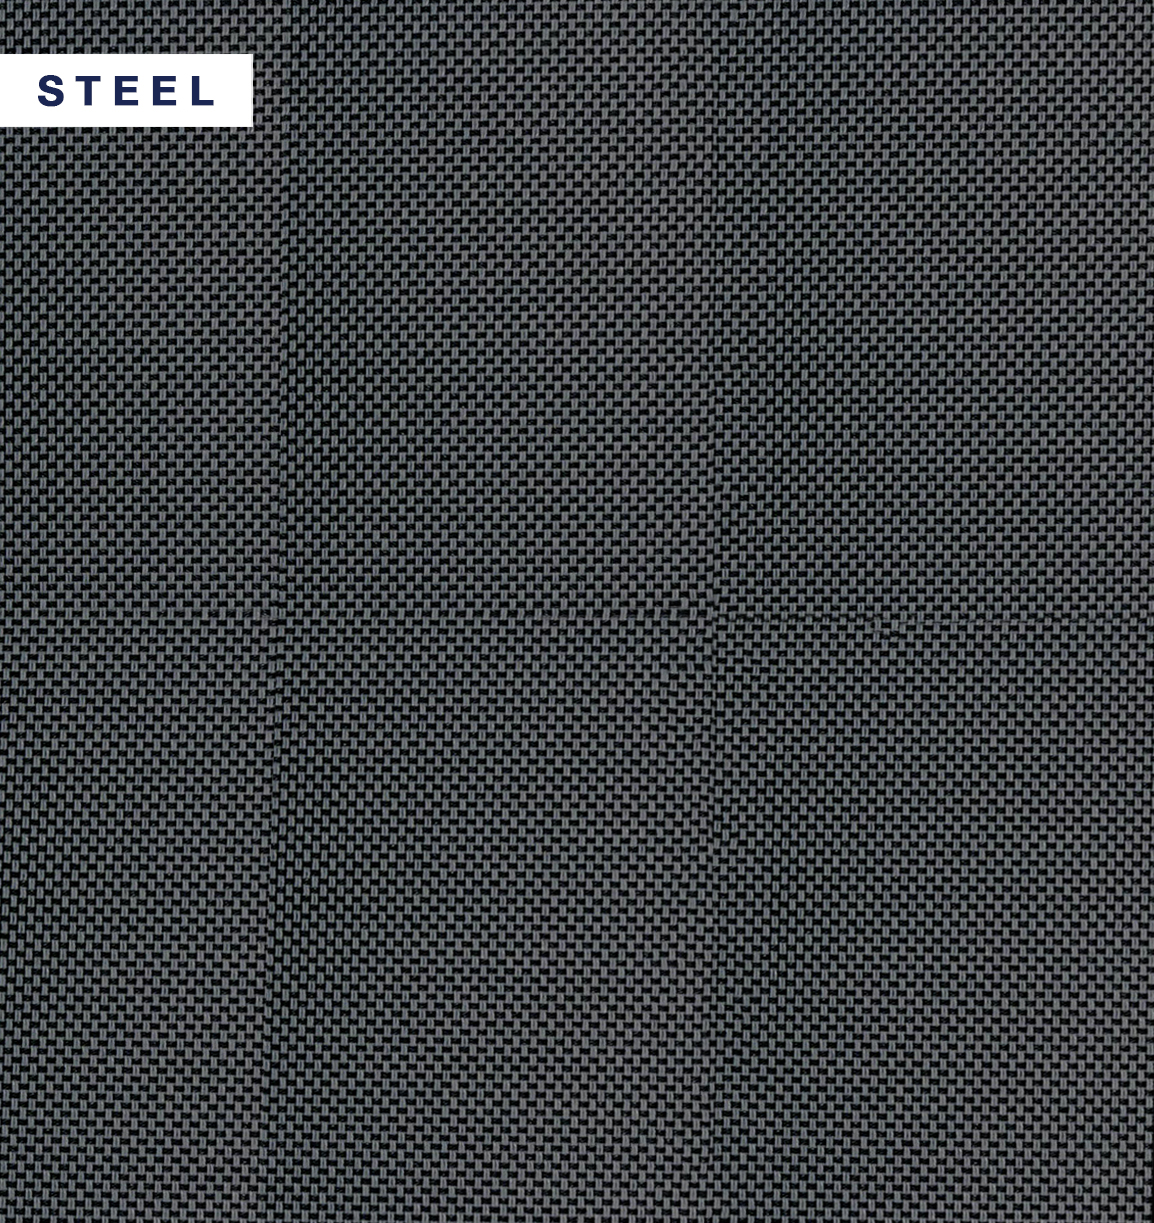 Phoenix - Steel.jpg